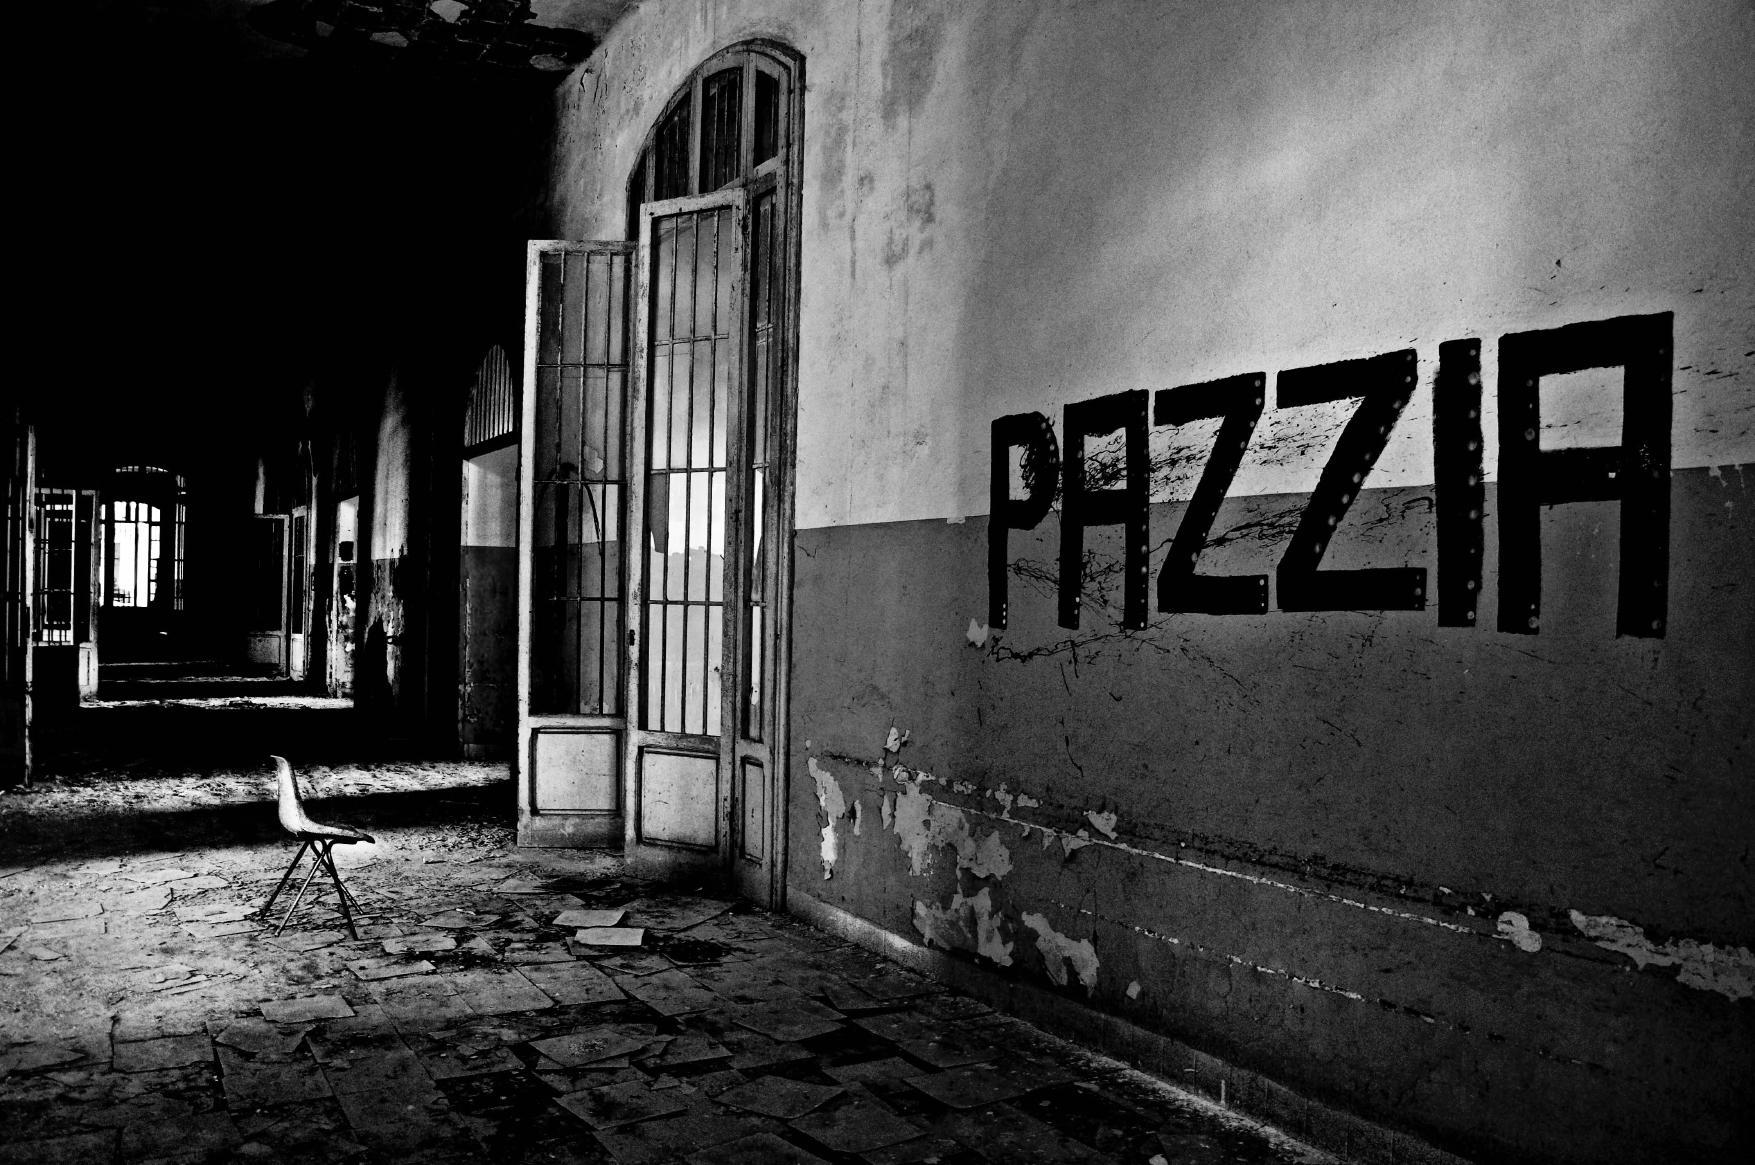 Pazzia - Luca Tesconi